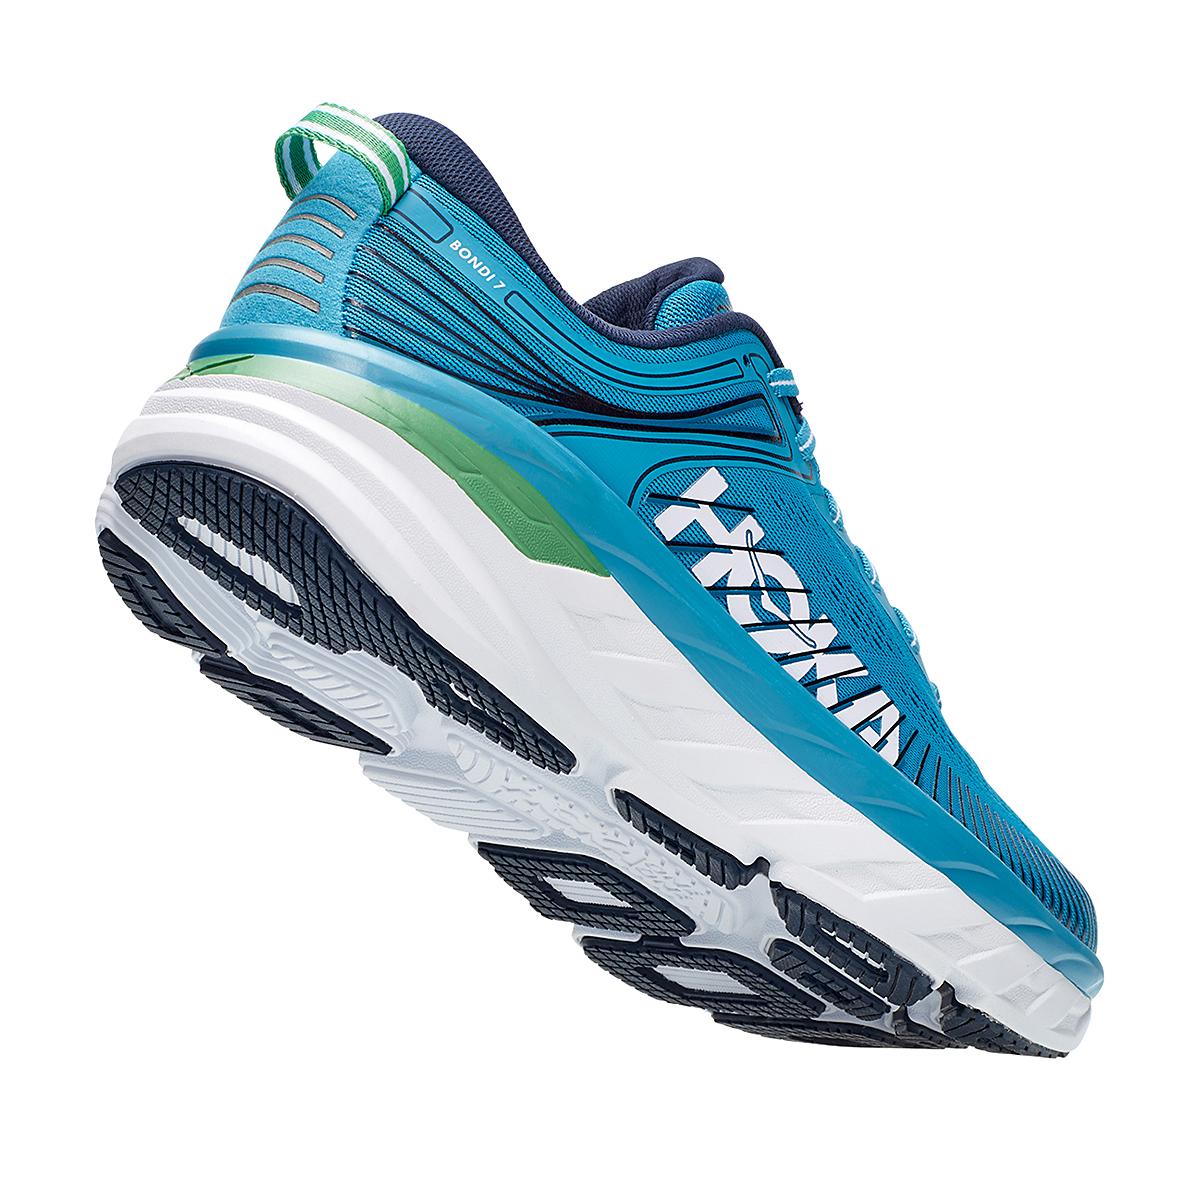 Men's Hoka One One Bondi 7 Running Shoe - Color: Blue Moon/Moonlit Ocean - Size: 7 - Width: Regular, Blue Moon/Moonlit Ocean, large, image 5